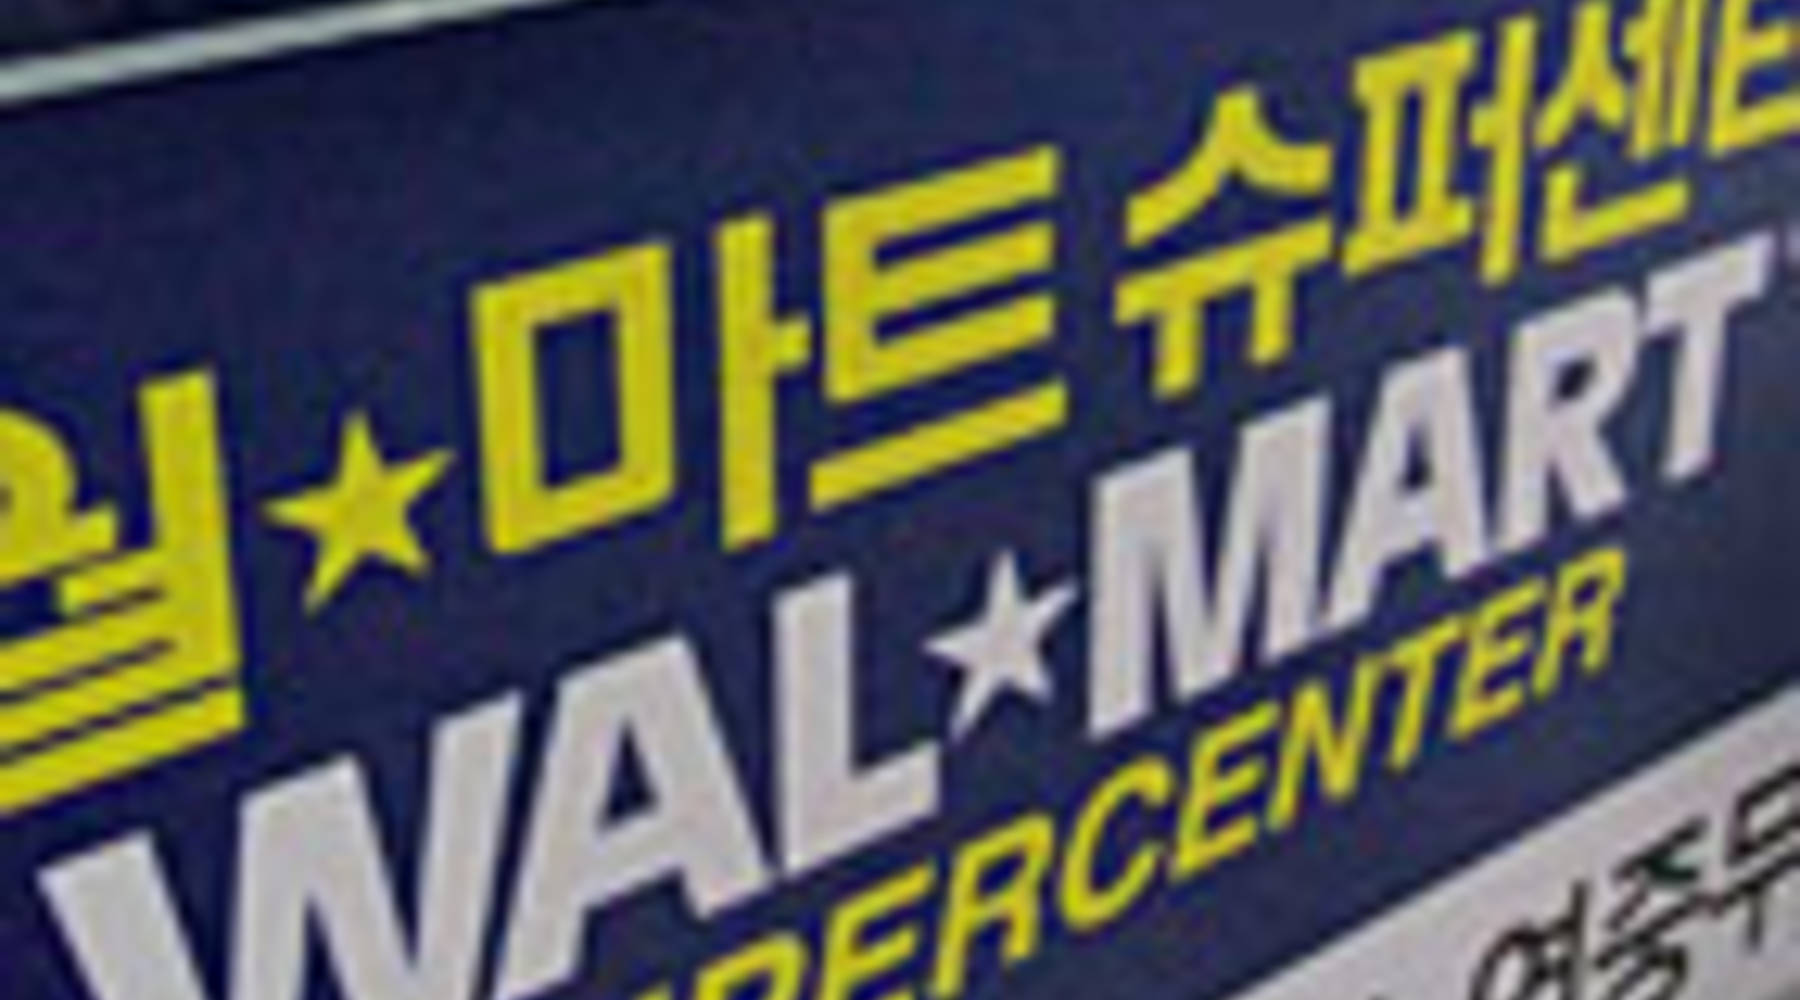 Wal-Mart fails in South Korea - Marketplace